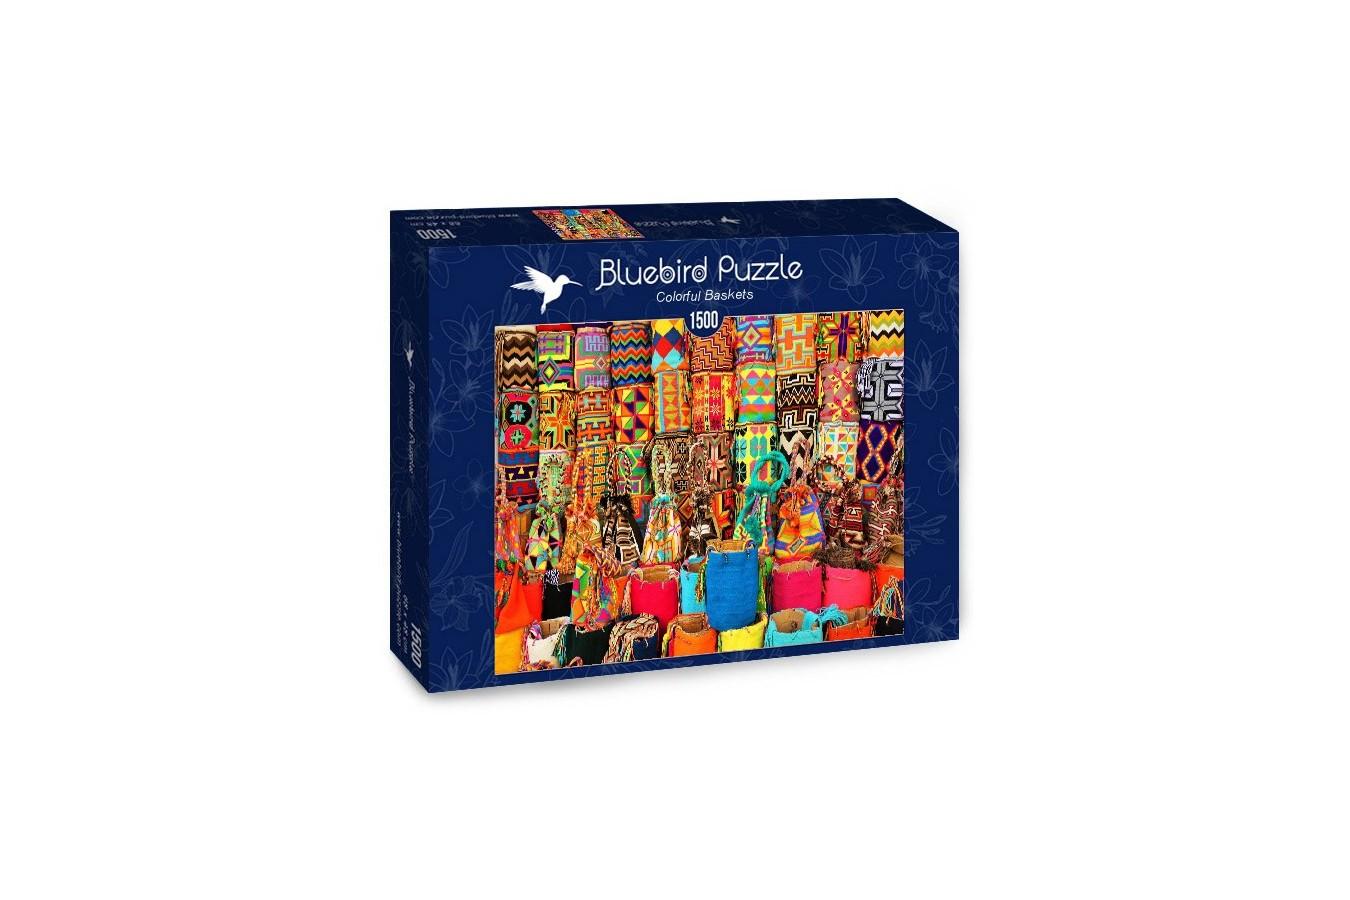 Puzzle Bluebird Puzzle - Colorful Baskets, 1500 piese (Bluebird-Puzzle-70223)